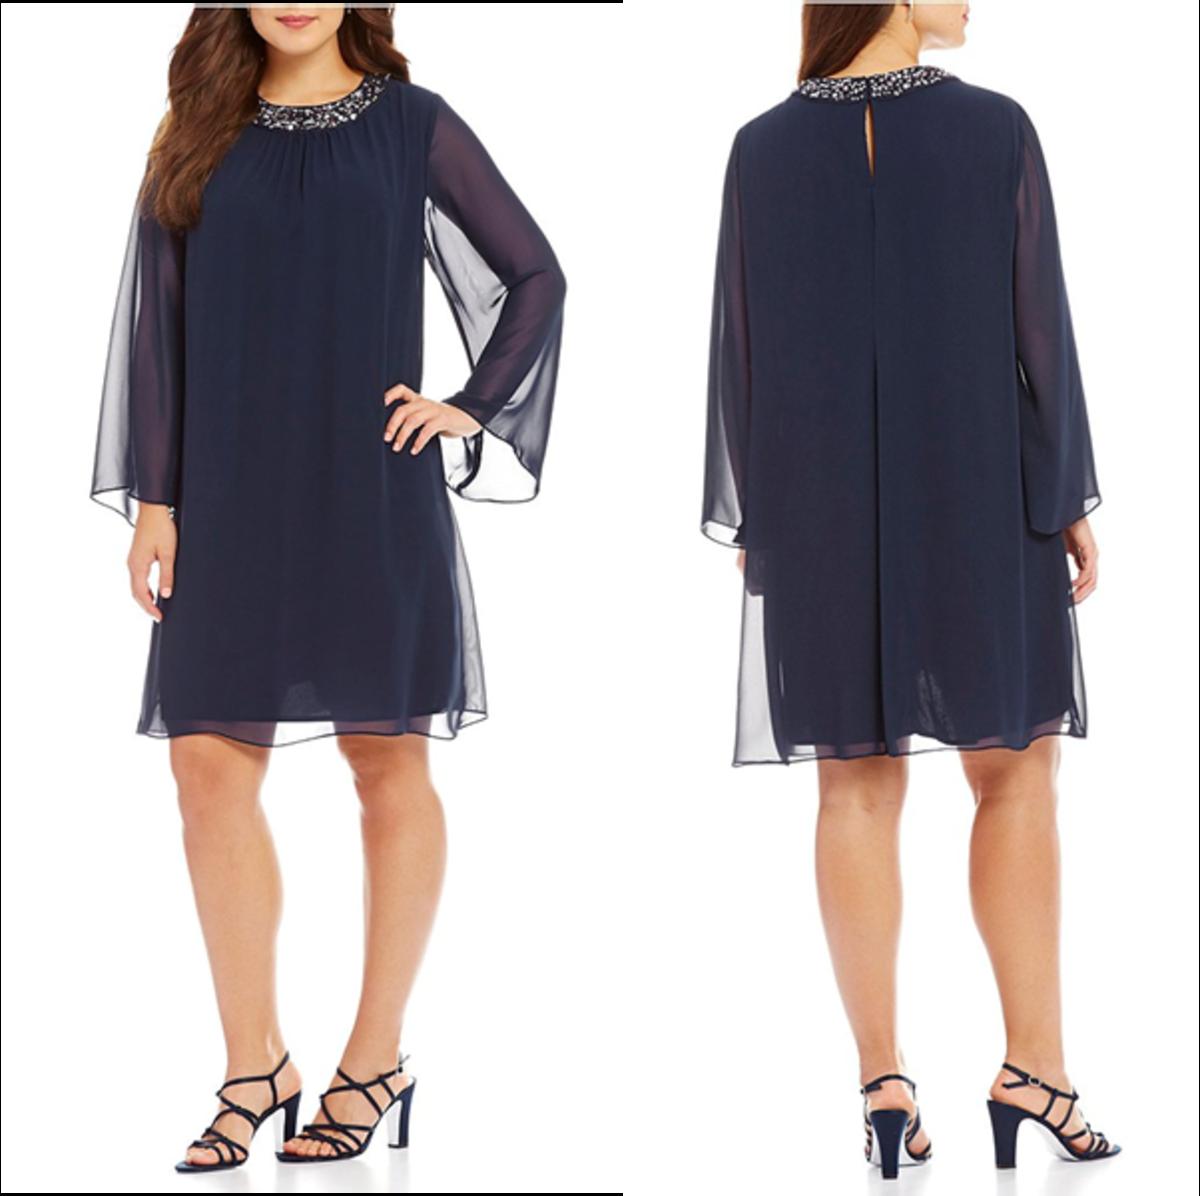 jewel neckline chiffon dress: trapeze silhouette, long sleeves